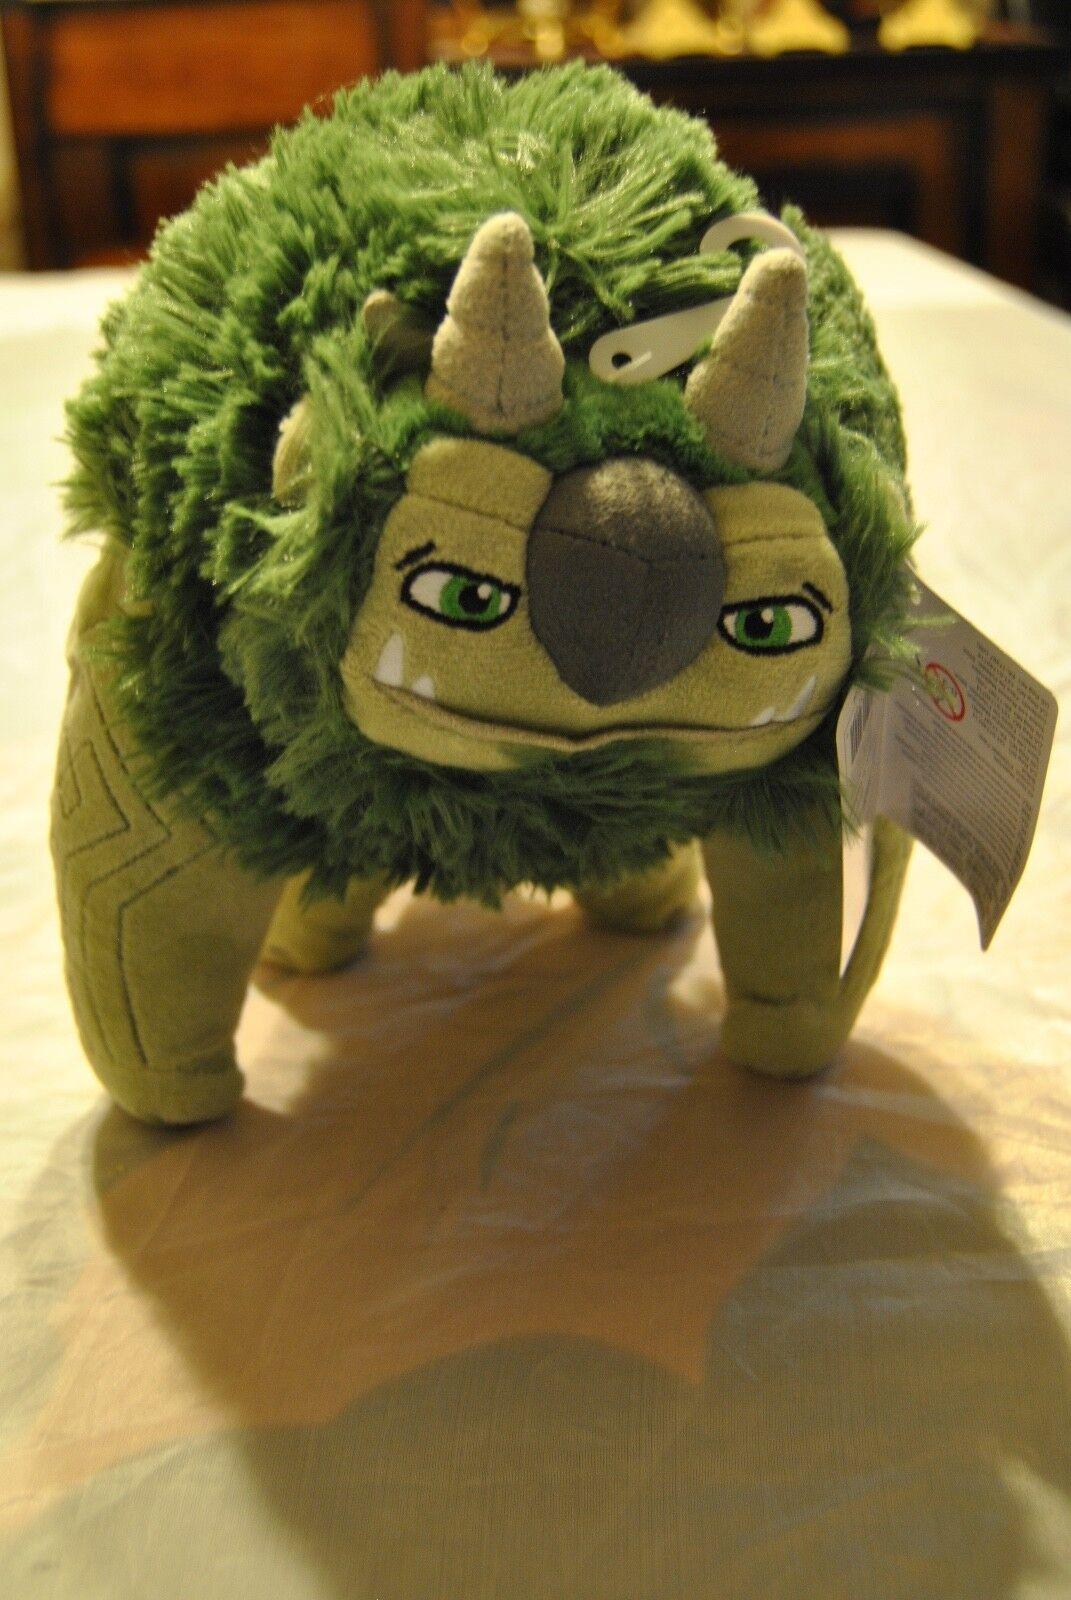 Dreamworks Troll Hunters Tales of Arcadia ARGH soft Plush Toy Green